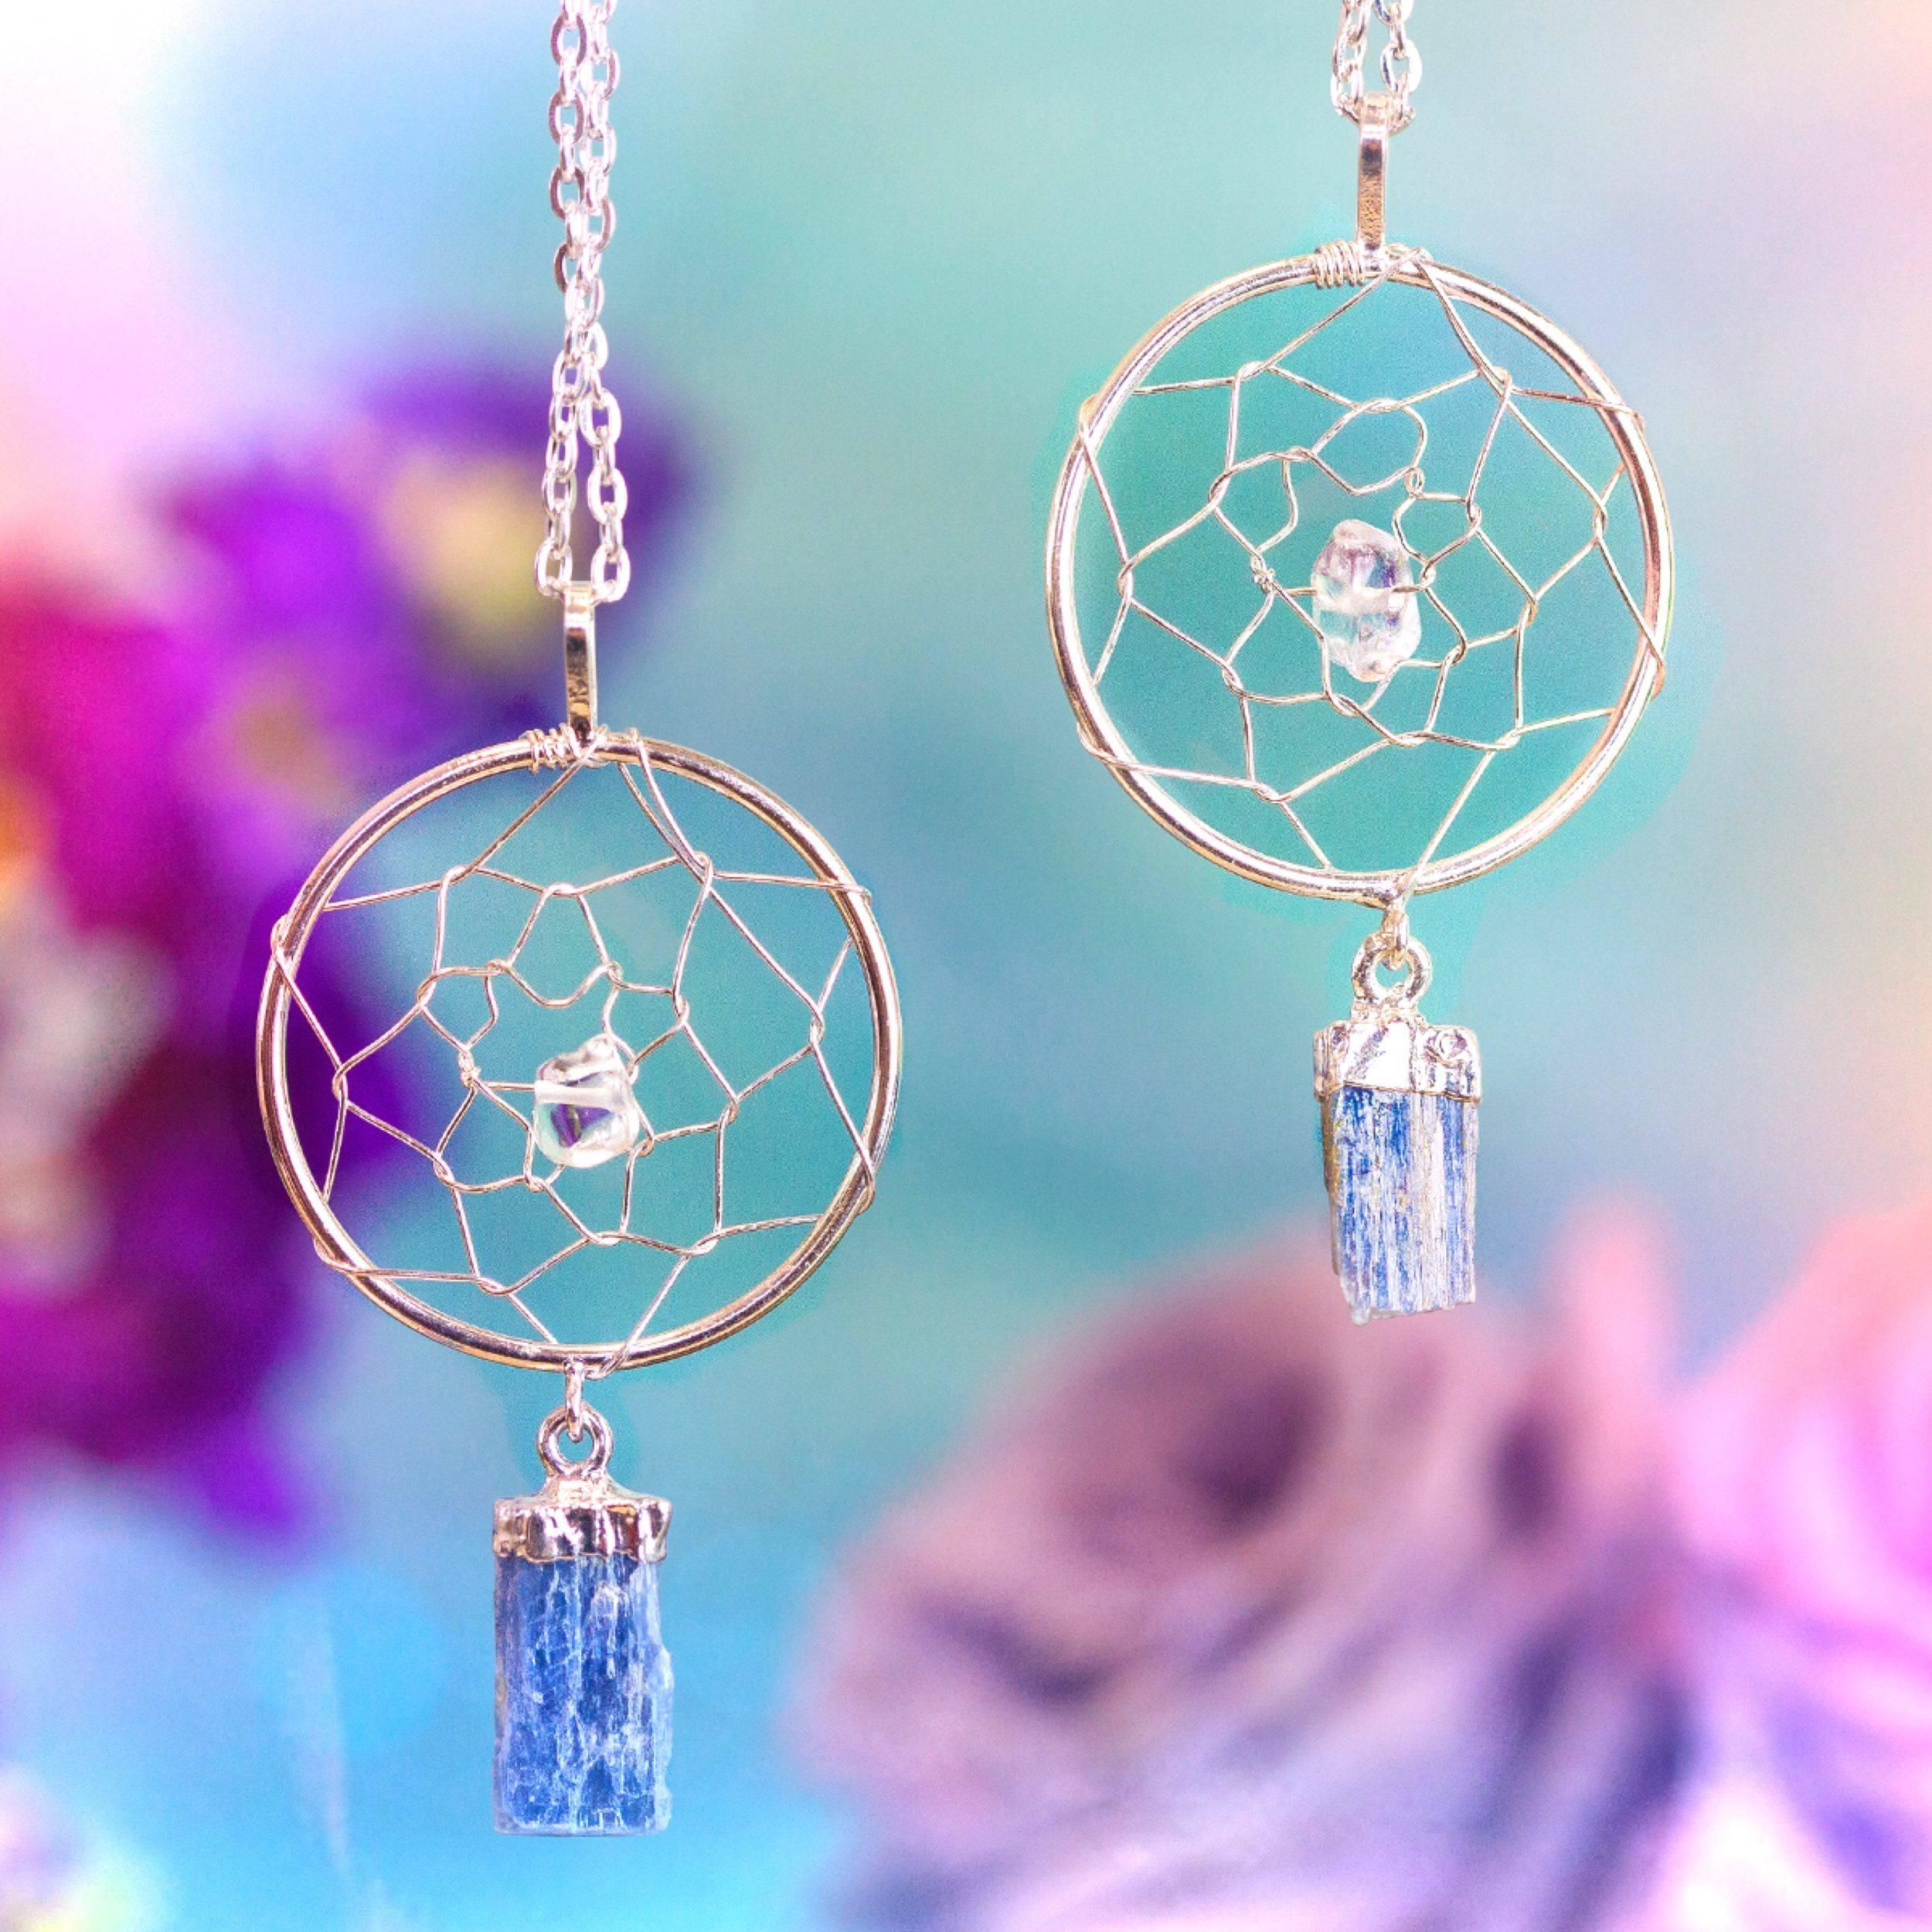 Total alignment dreamcatcher pendants for protection and heightened total alignment dreamcatcher pendants for protection and heightened spiritual awareness aloadofball Choice Image